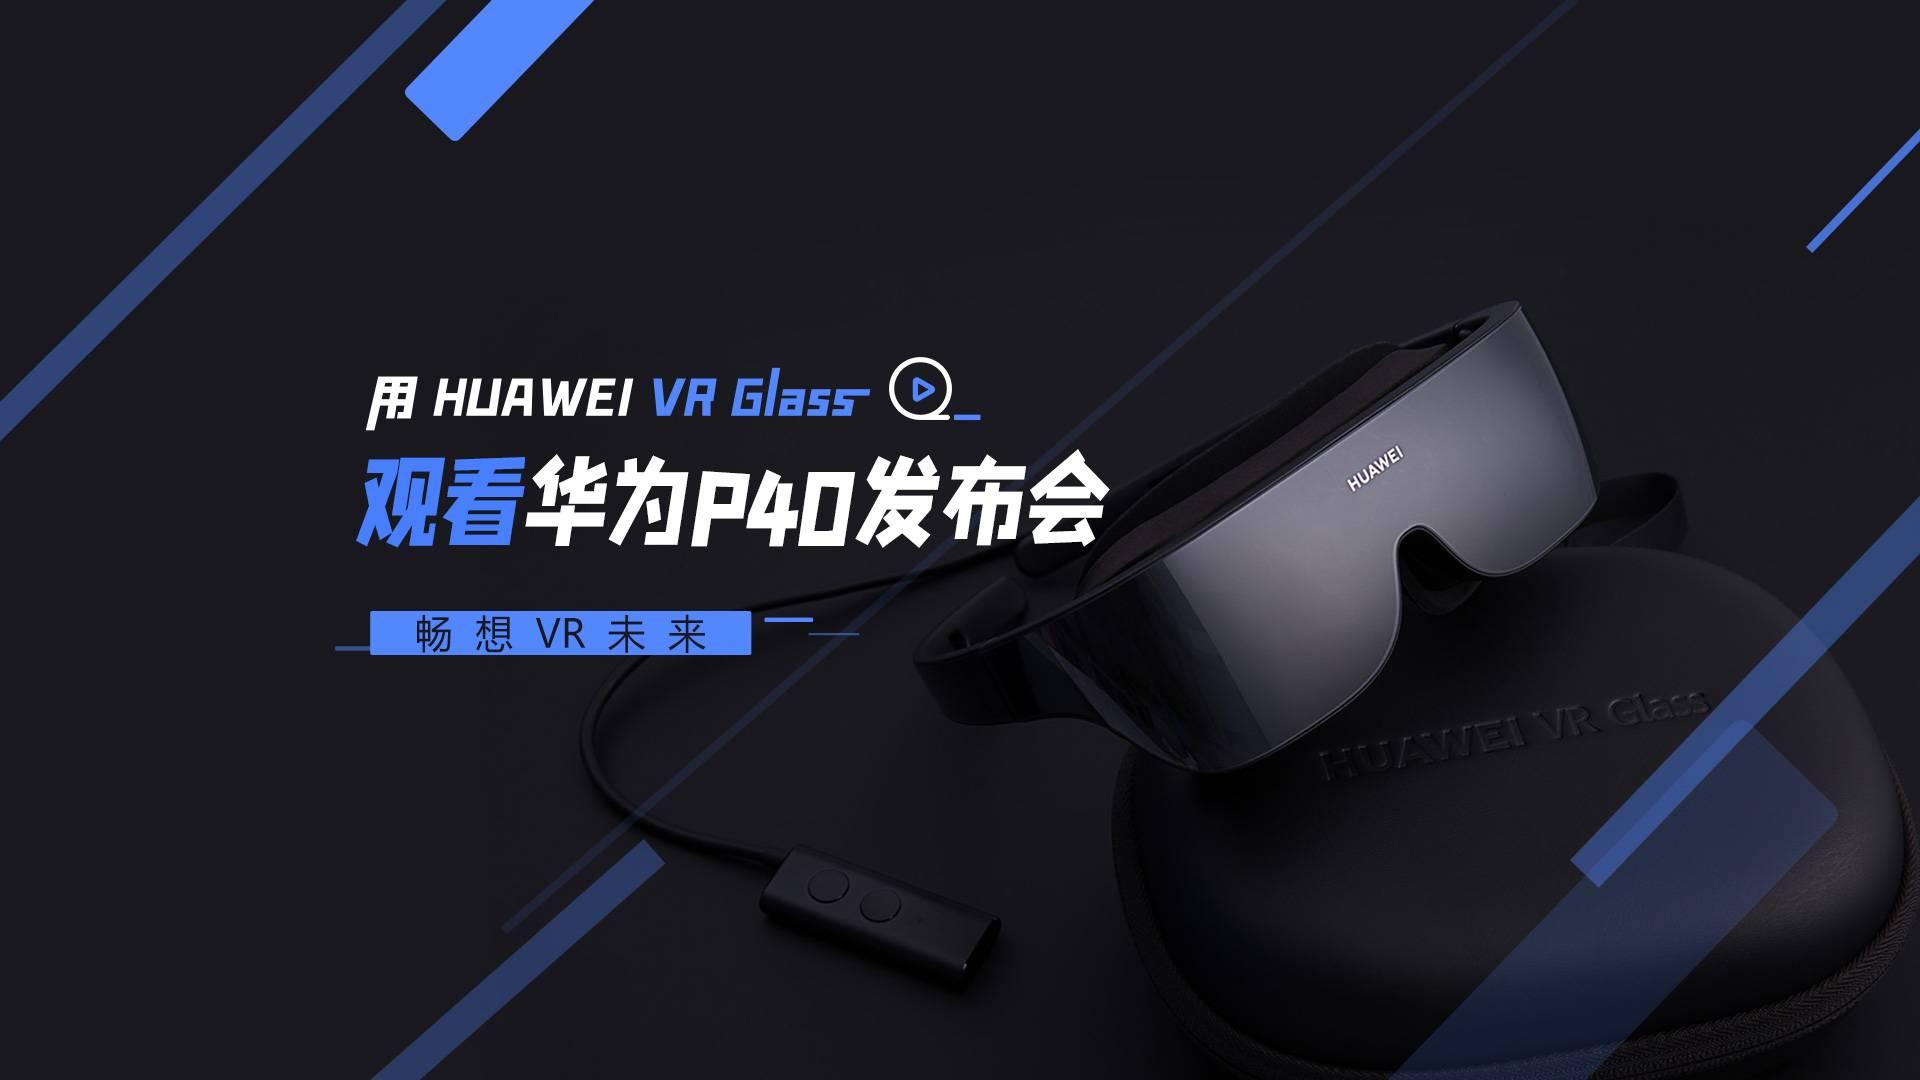 用HUAWEI VR Glass观看华为P40发布会 畅想VR未来